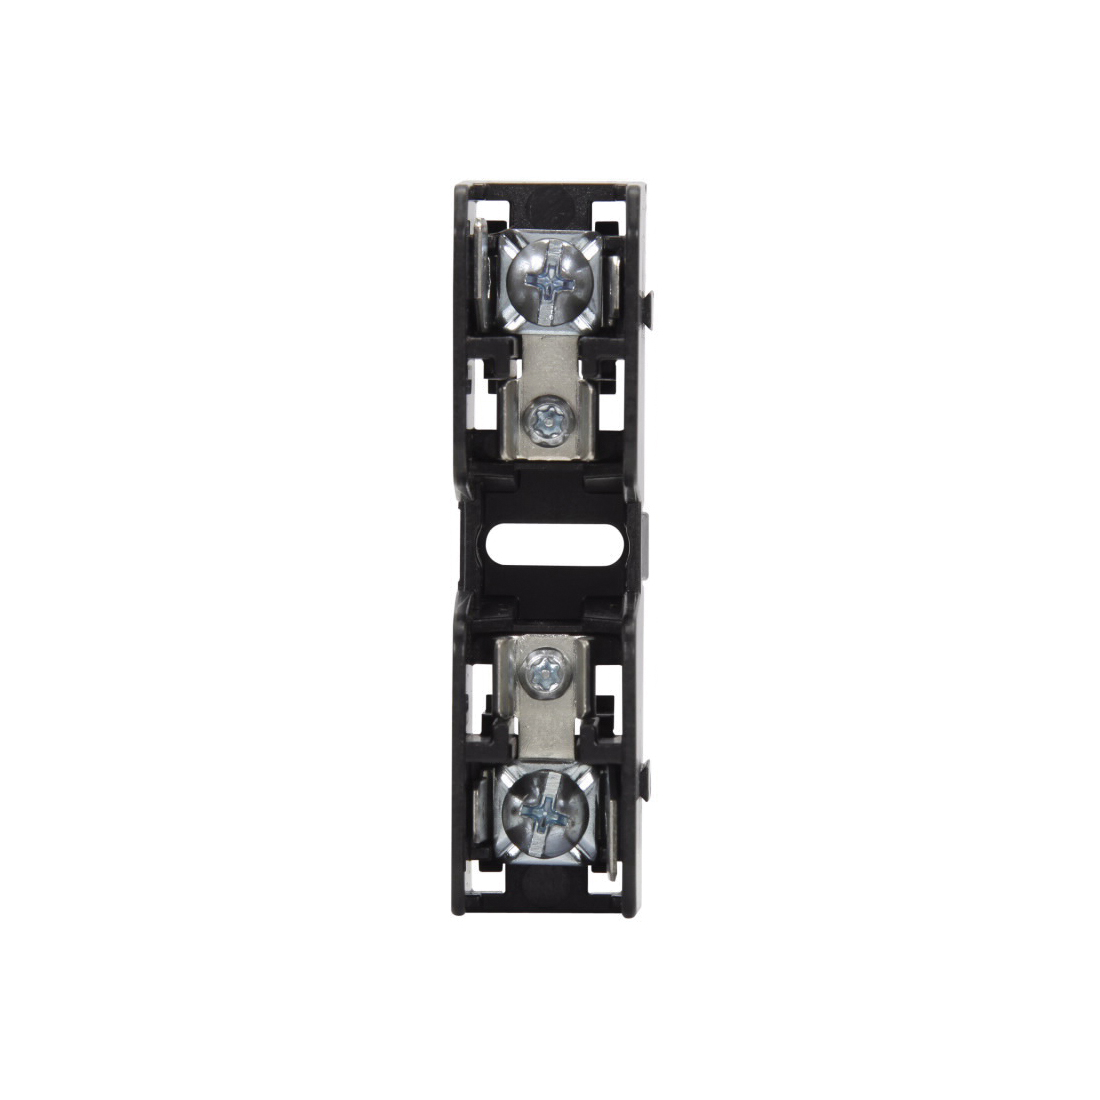 Bussmann® BCM603-1PQ BCM Fuse Block, 600 VAC, 30 A, 18 to 10 AWG Wire, 1  Pole